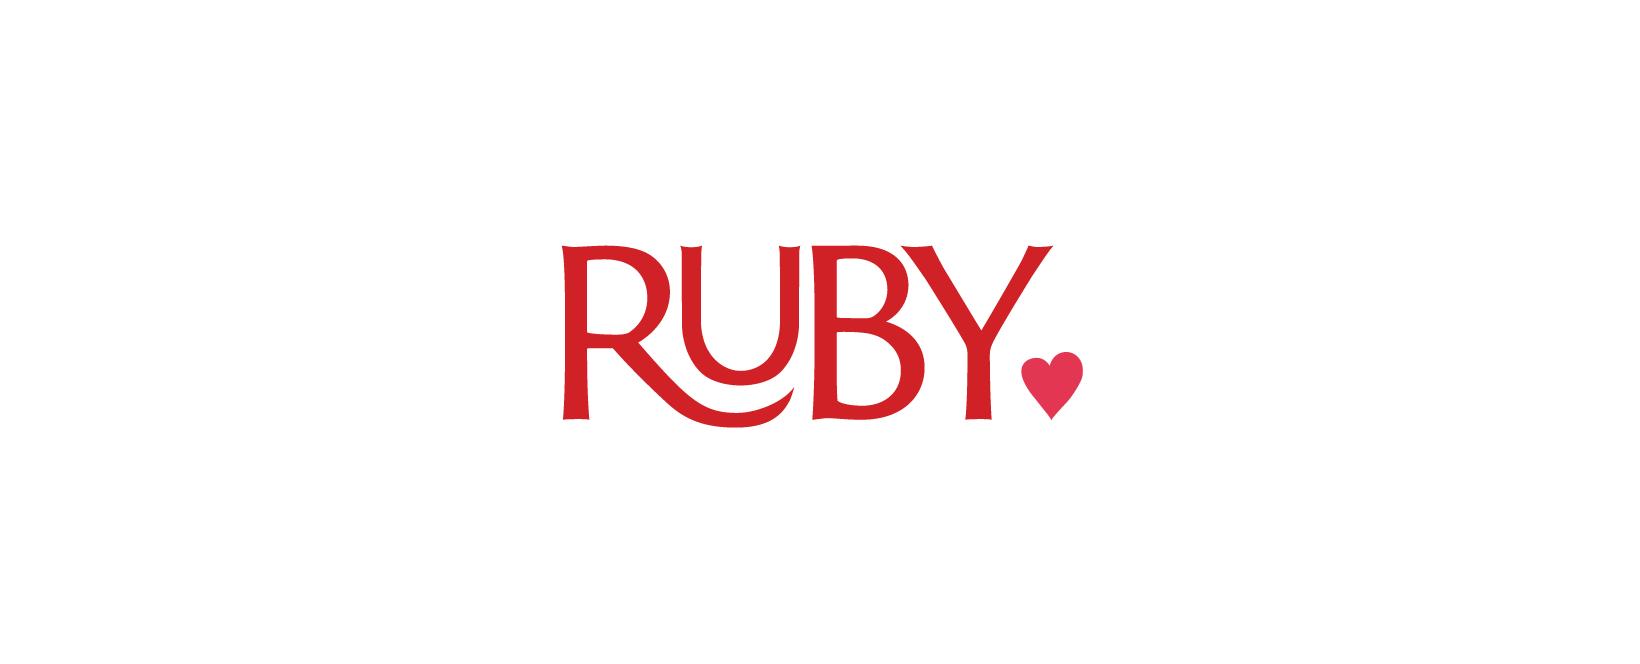 Ruby Love Discount Code 2021